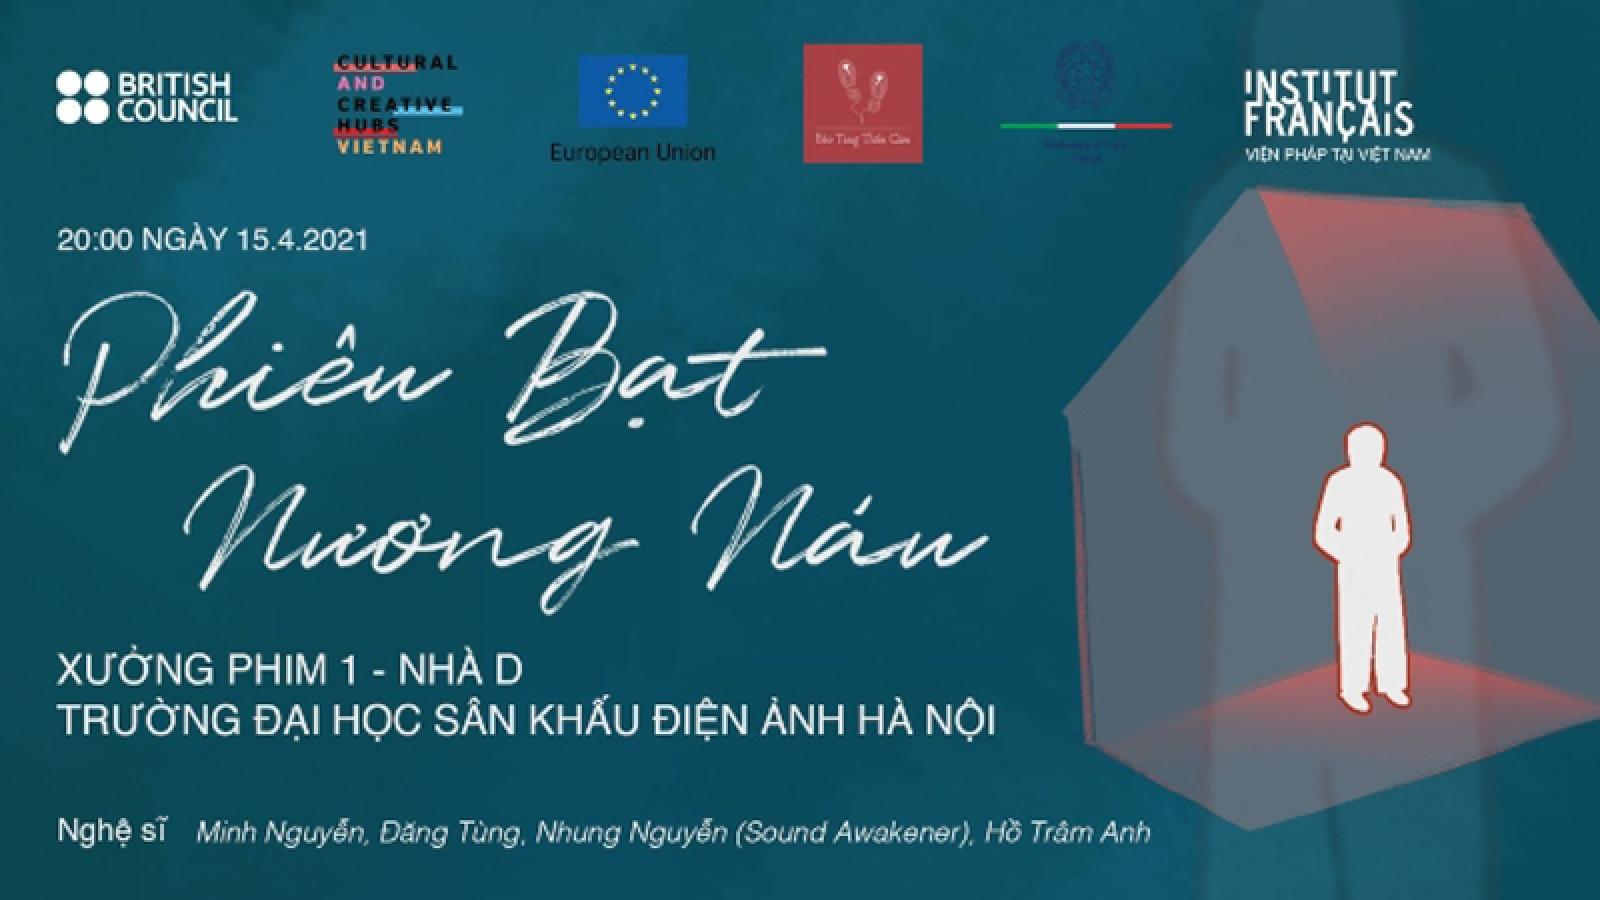 Cine-concert: Adrift/Sheltered to take place on April 15